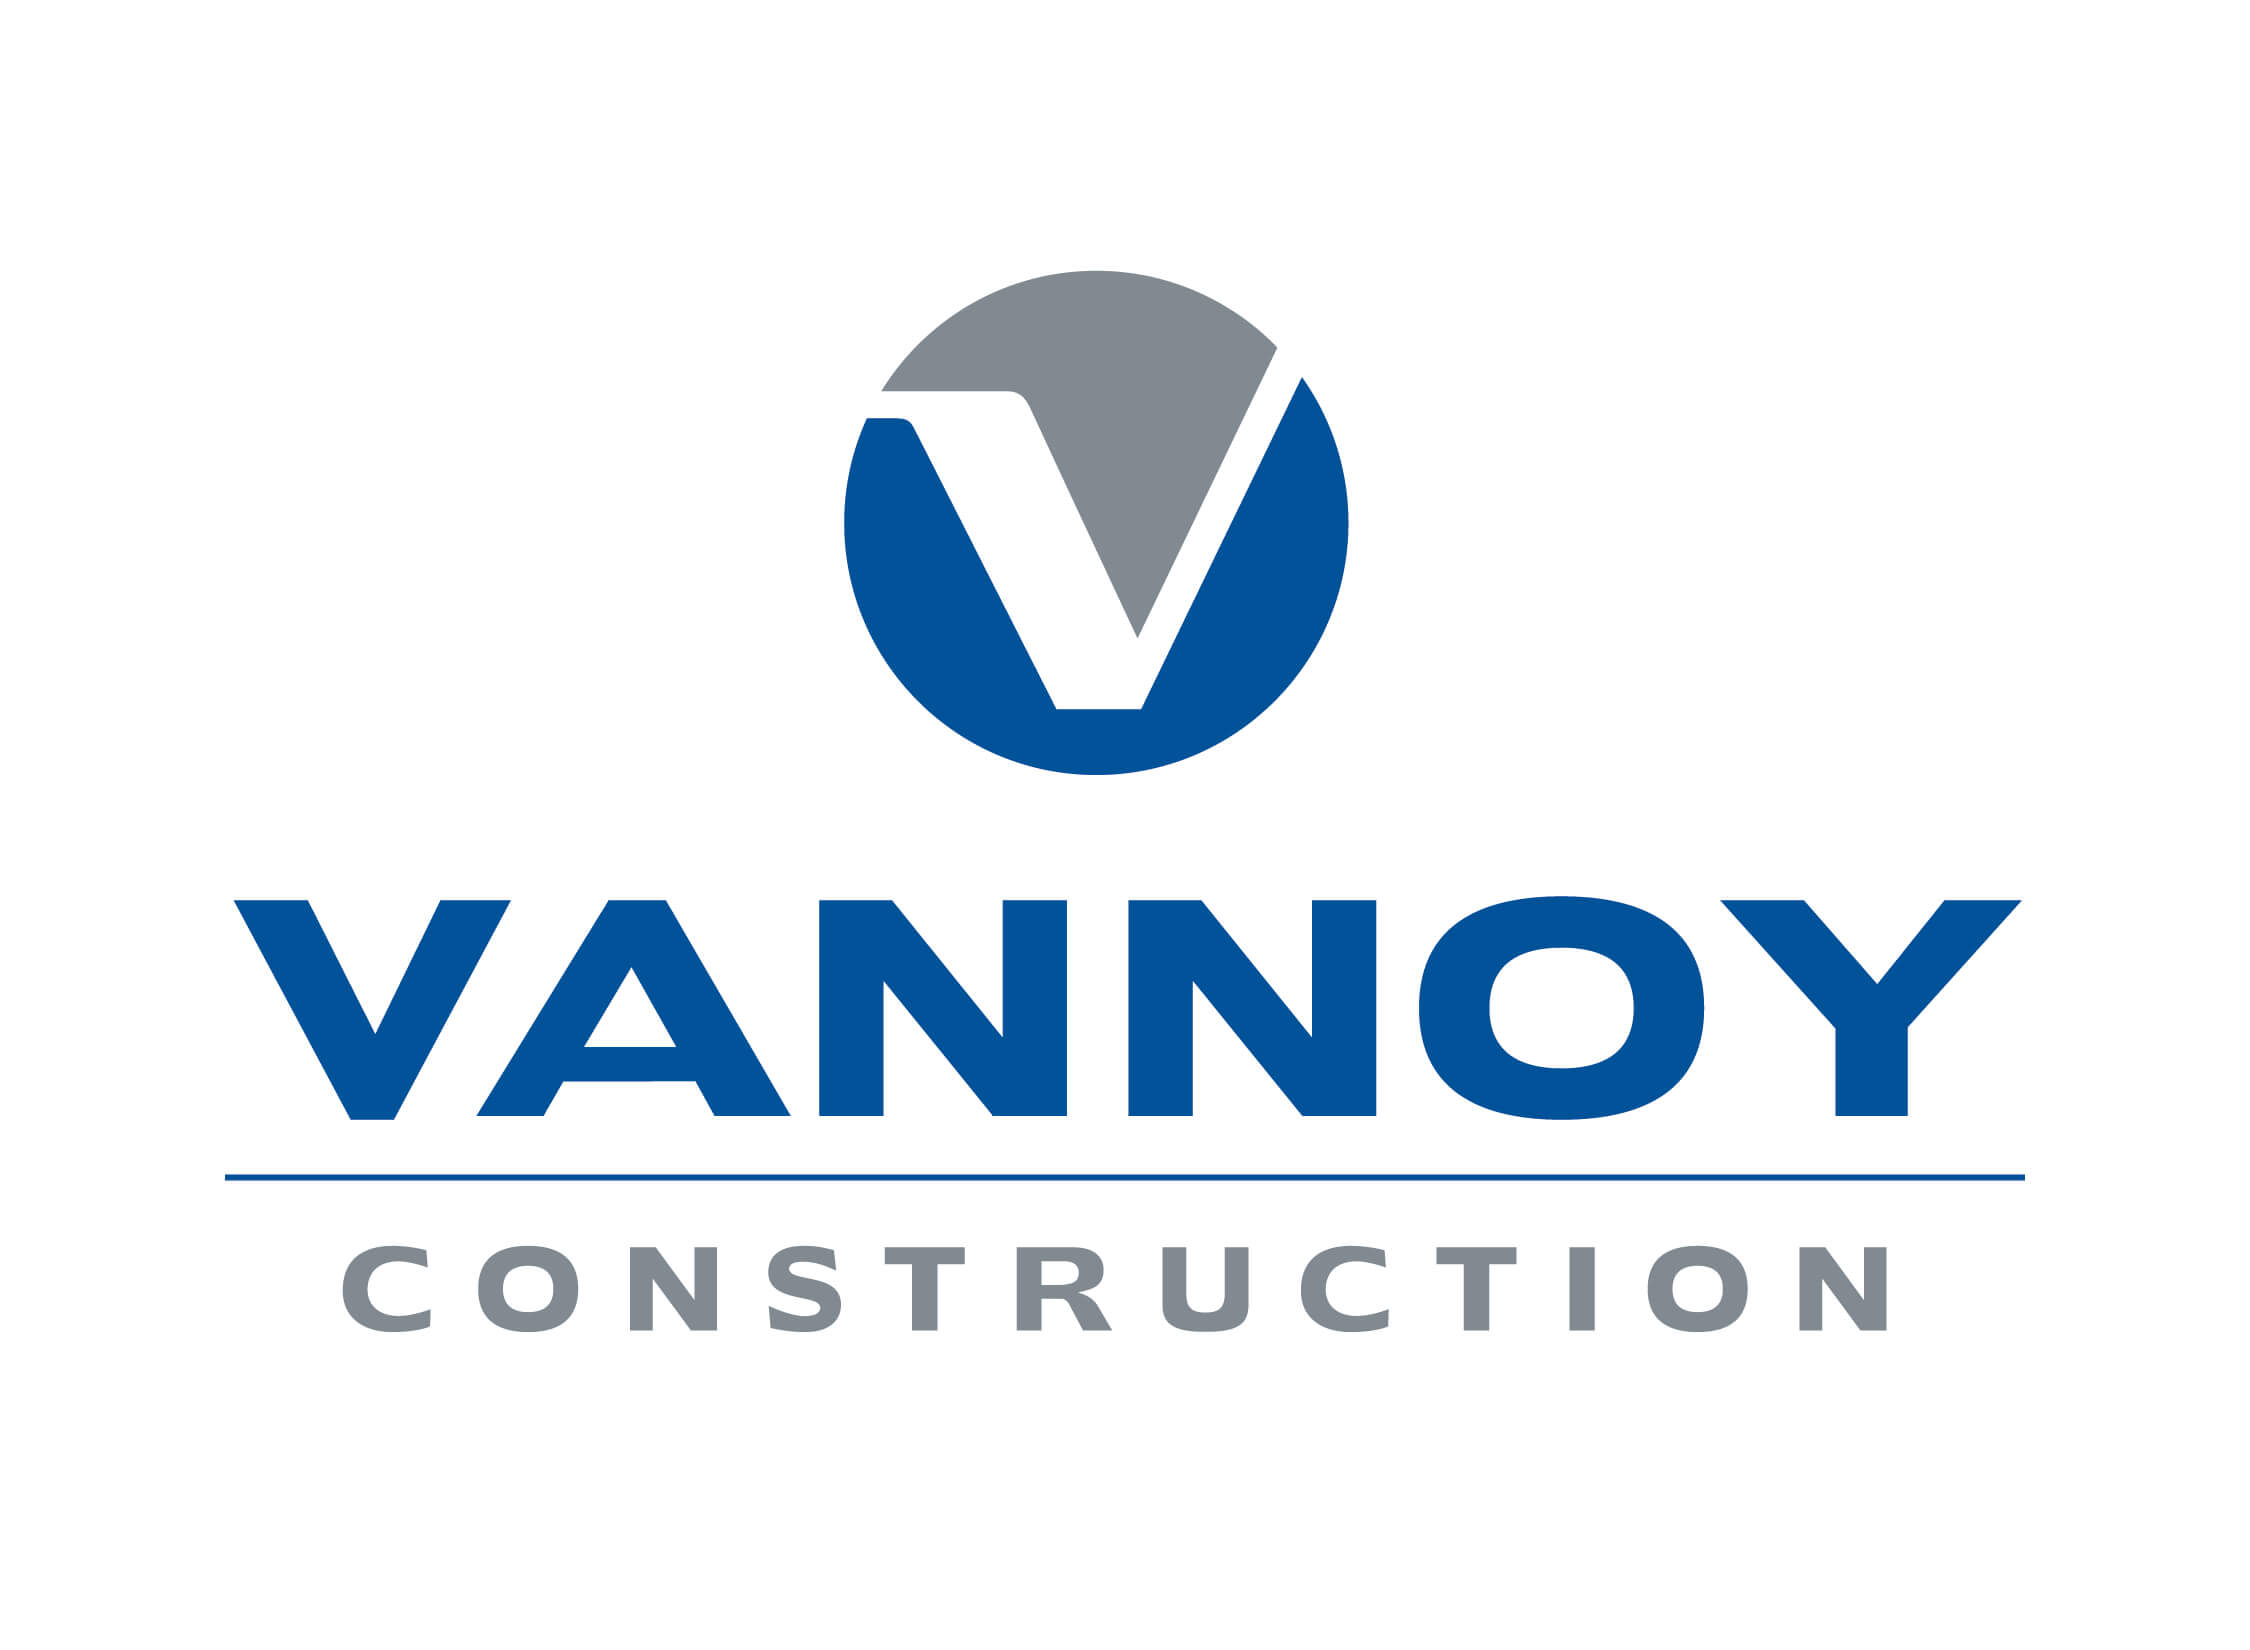 Vannoy Construction  logo